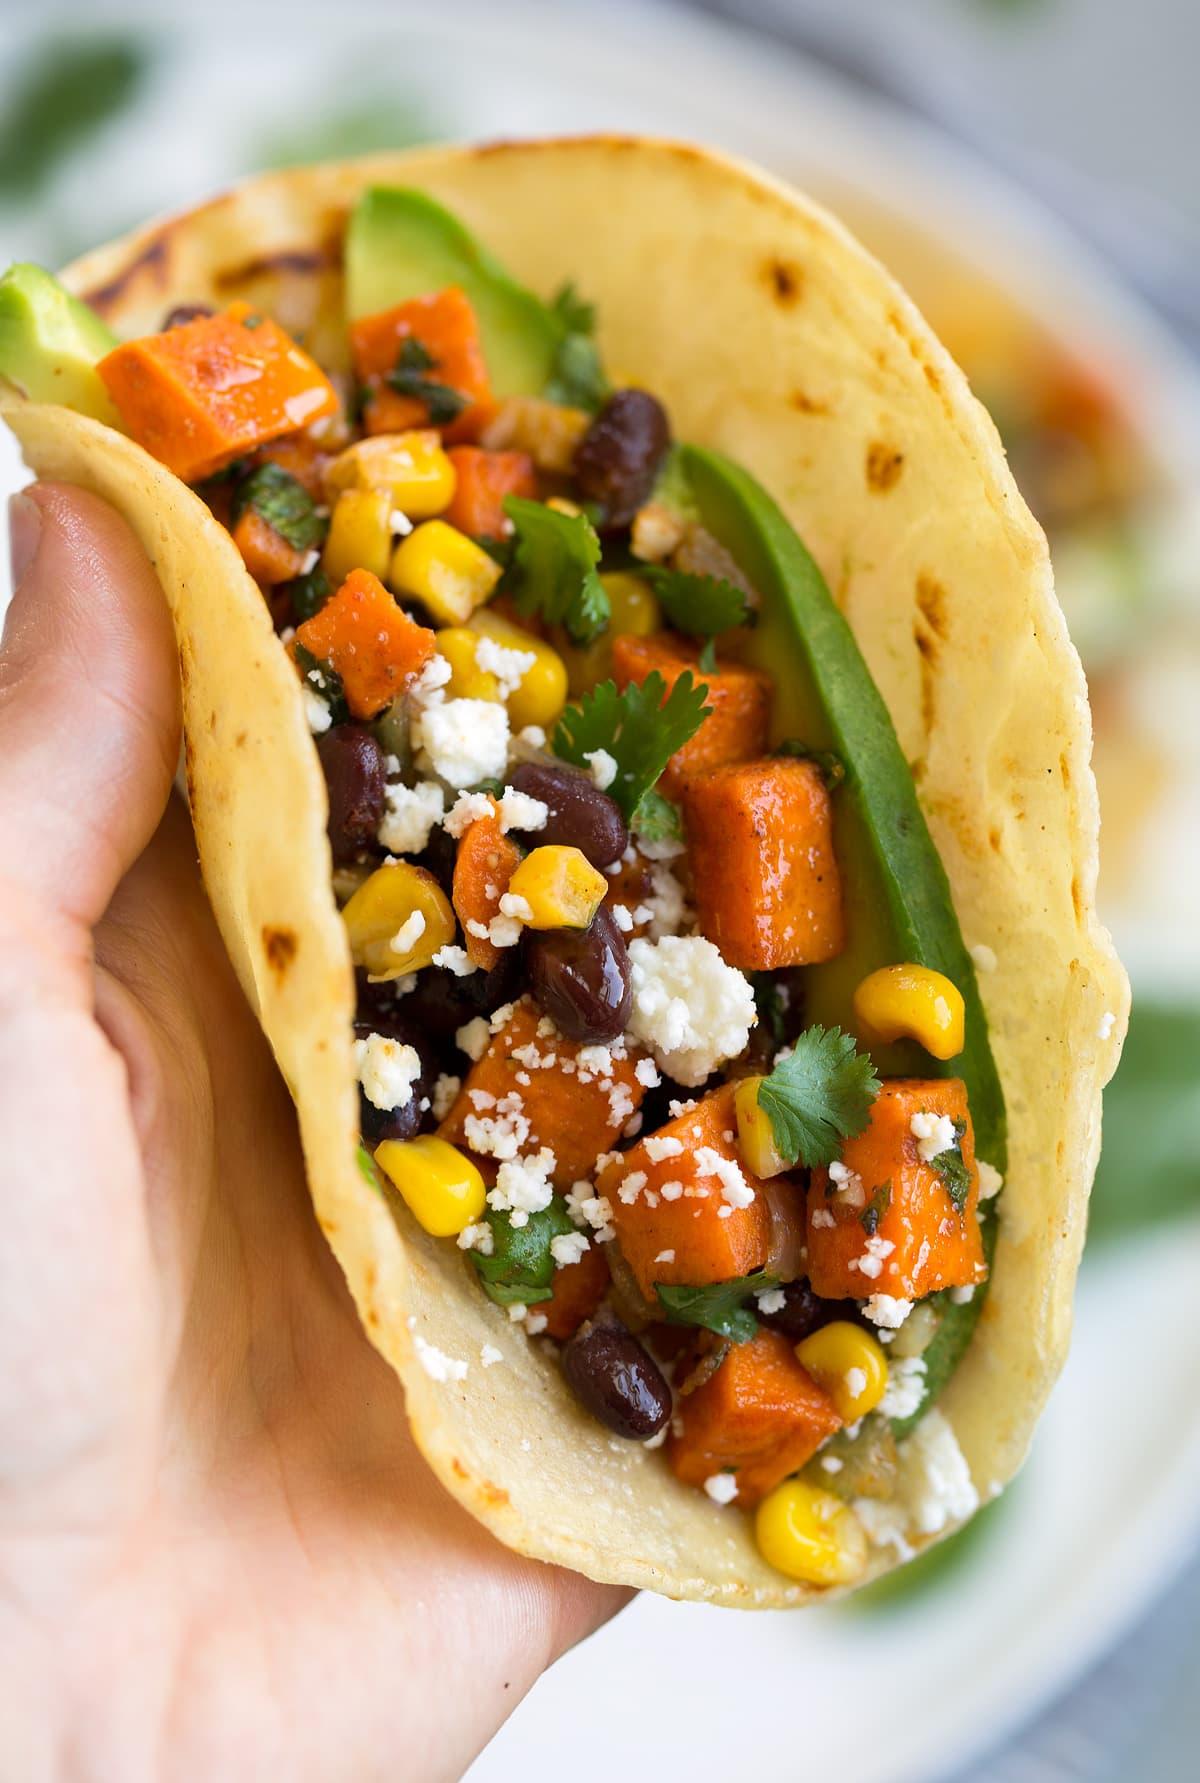 Close up image of vegetarian filled sweet potato, black bean and avocado taco.